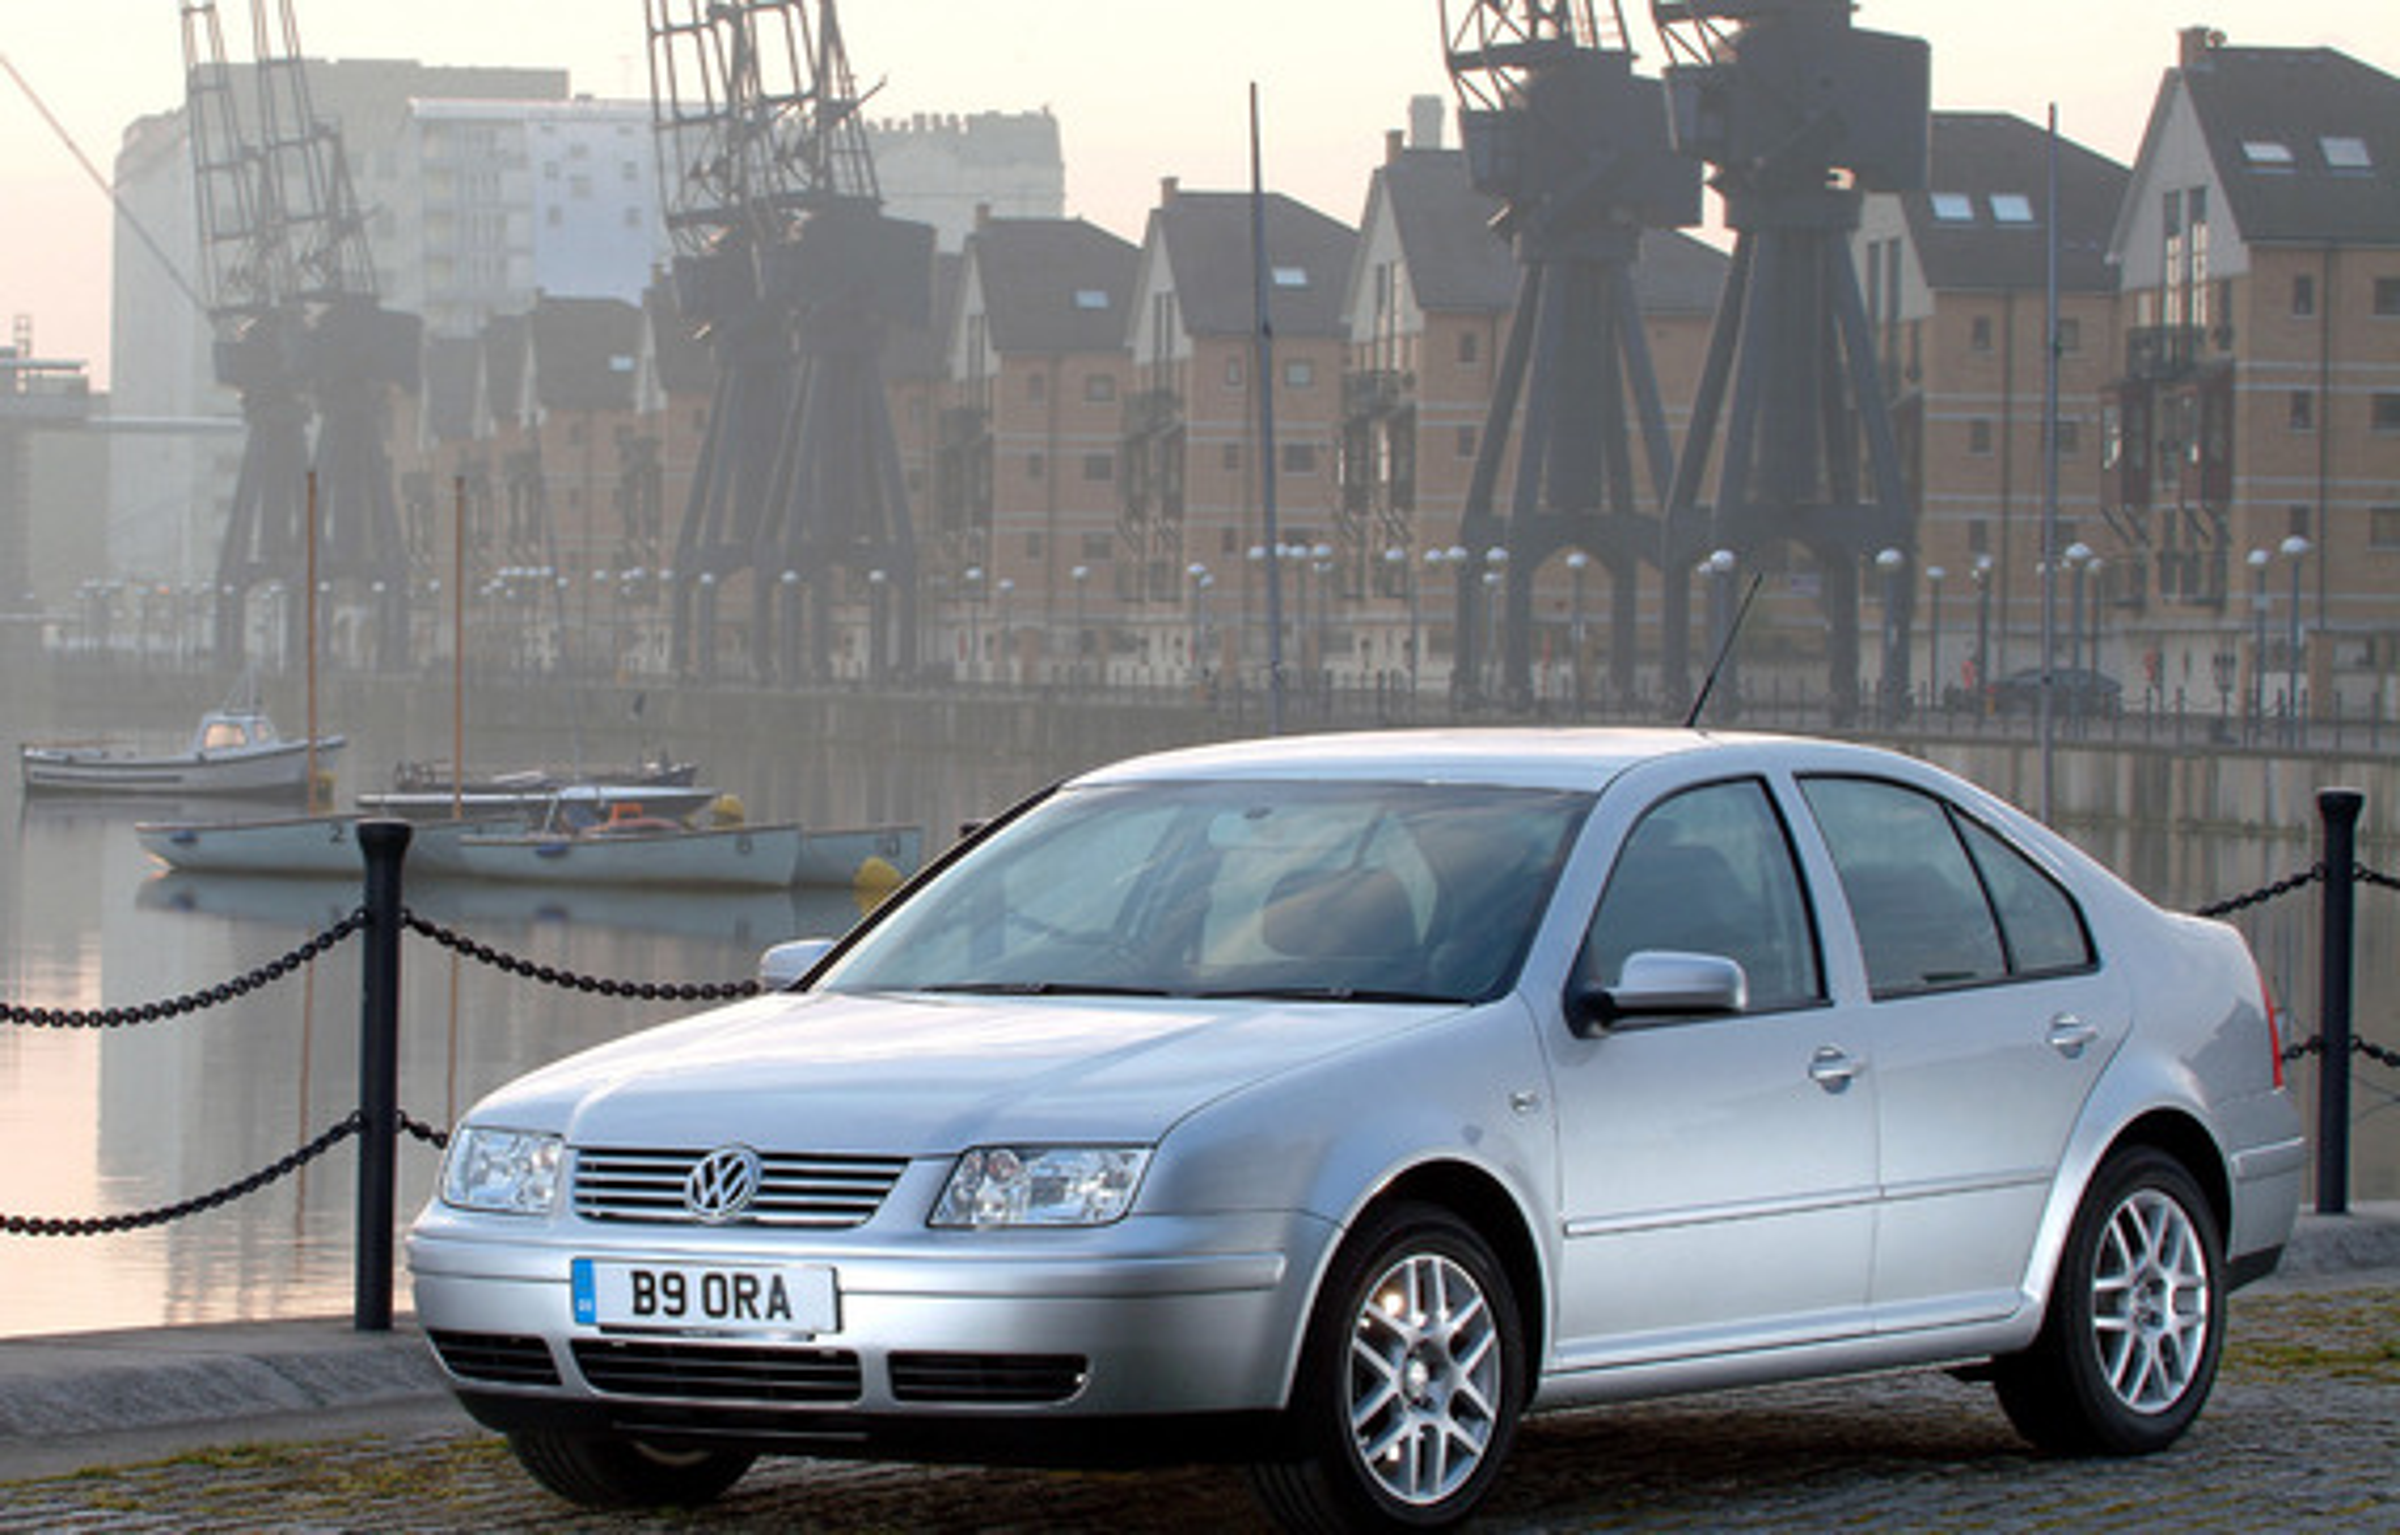 Volkswagen Bora (Jetta) A4 — описание модели